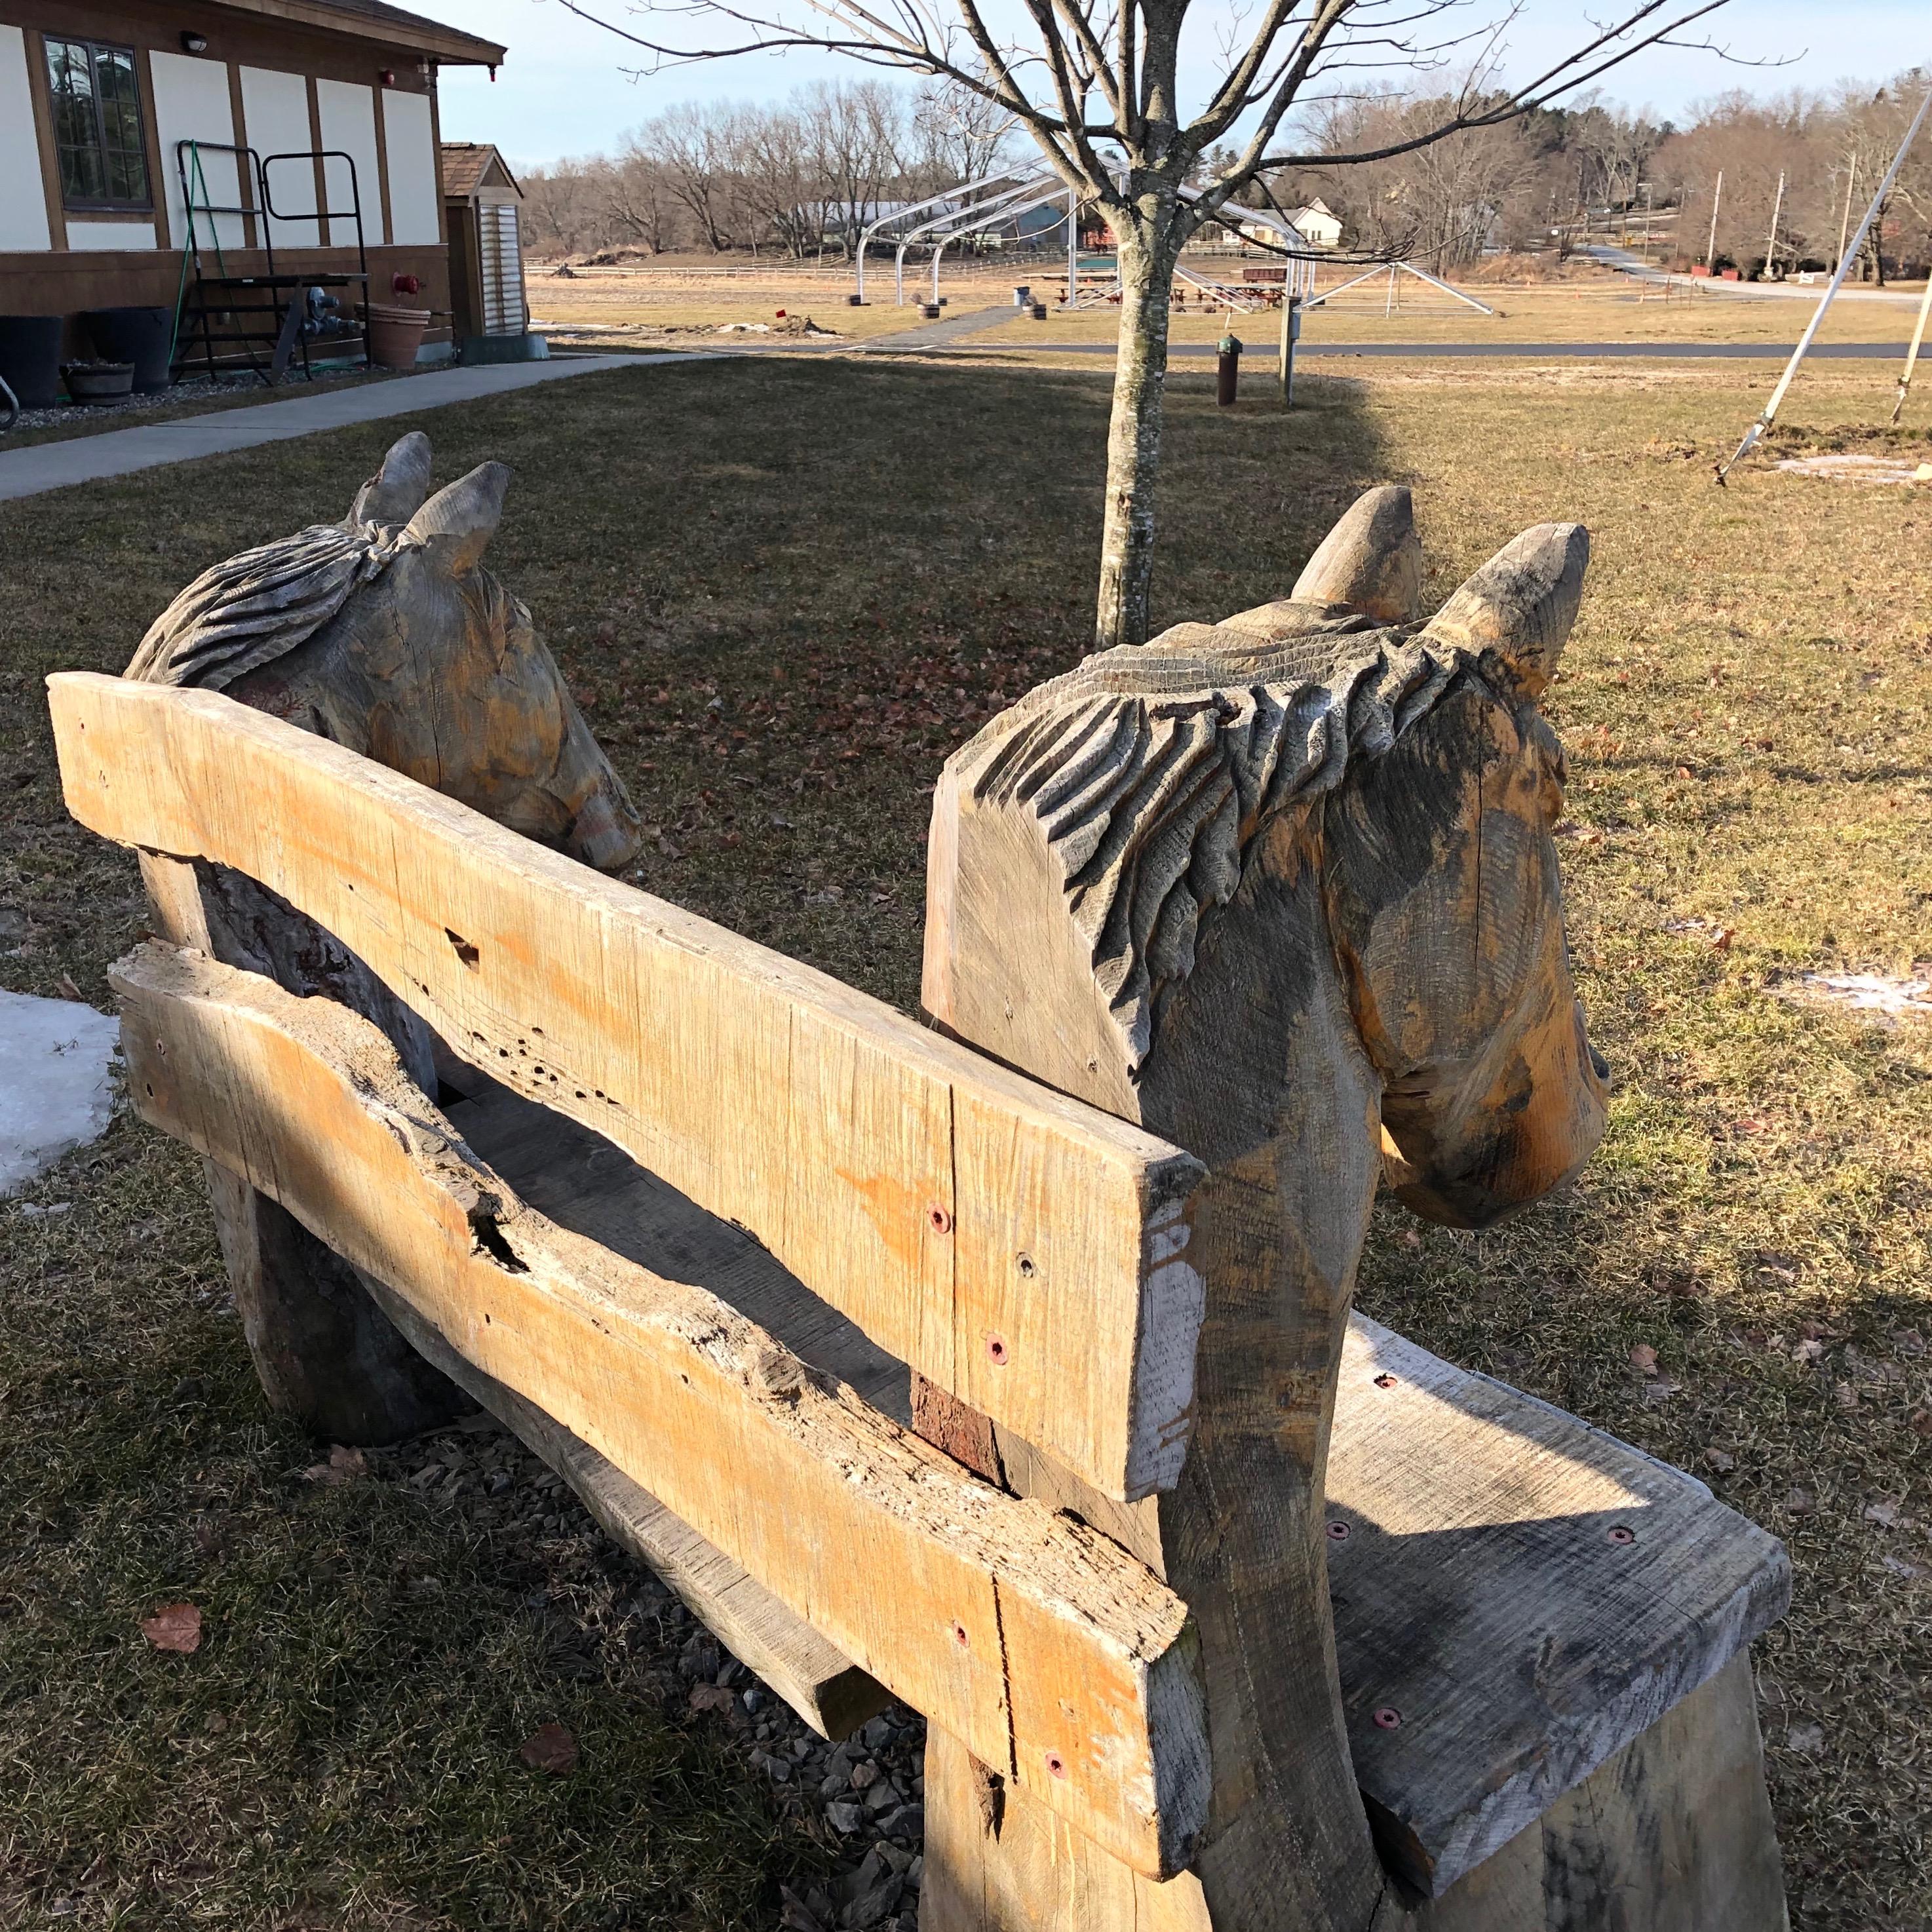 021019-Verrill-Farm-horse-bench